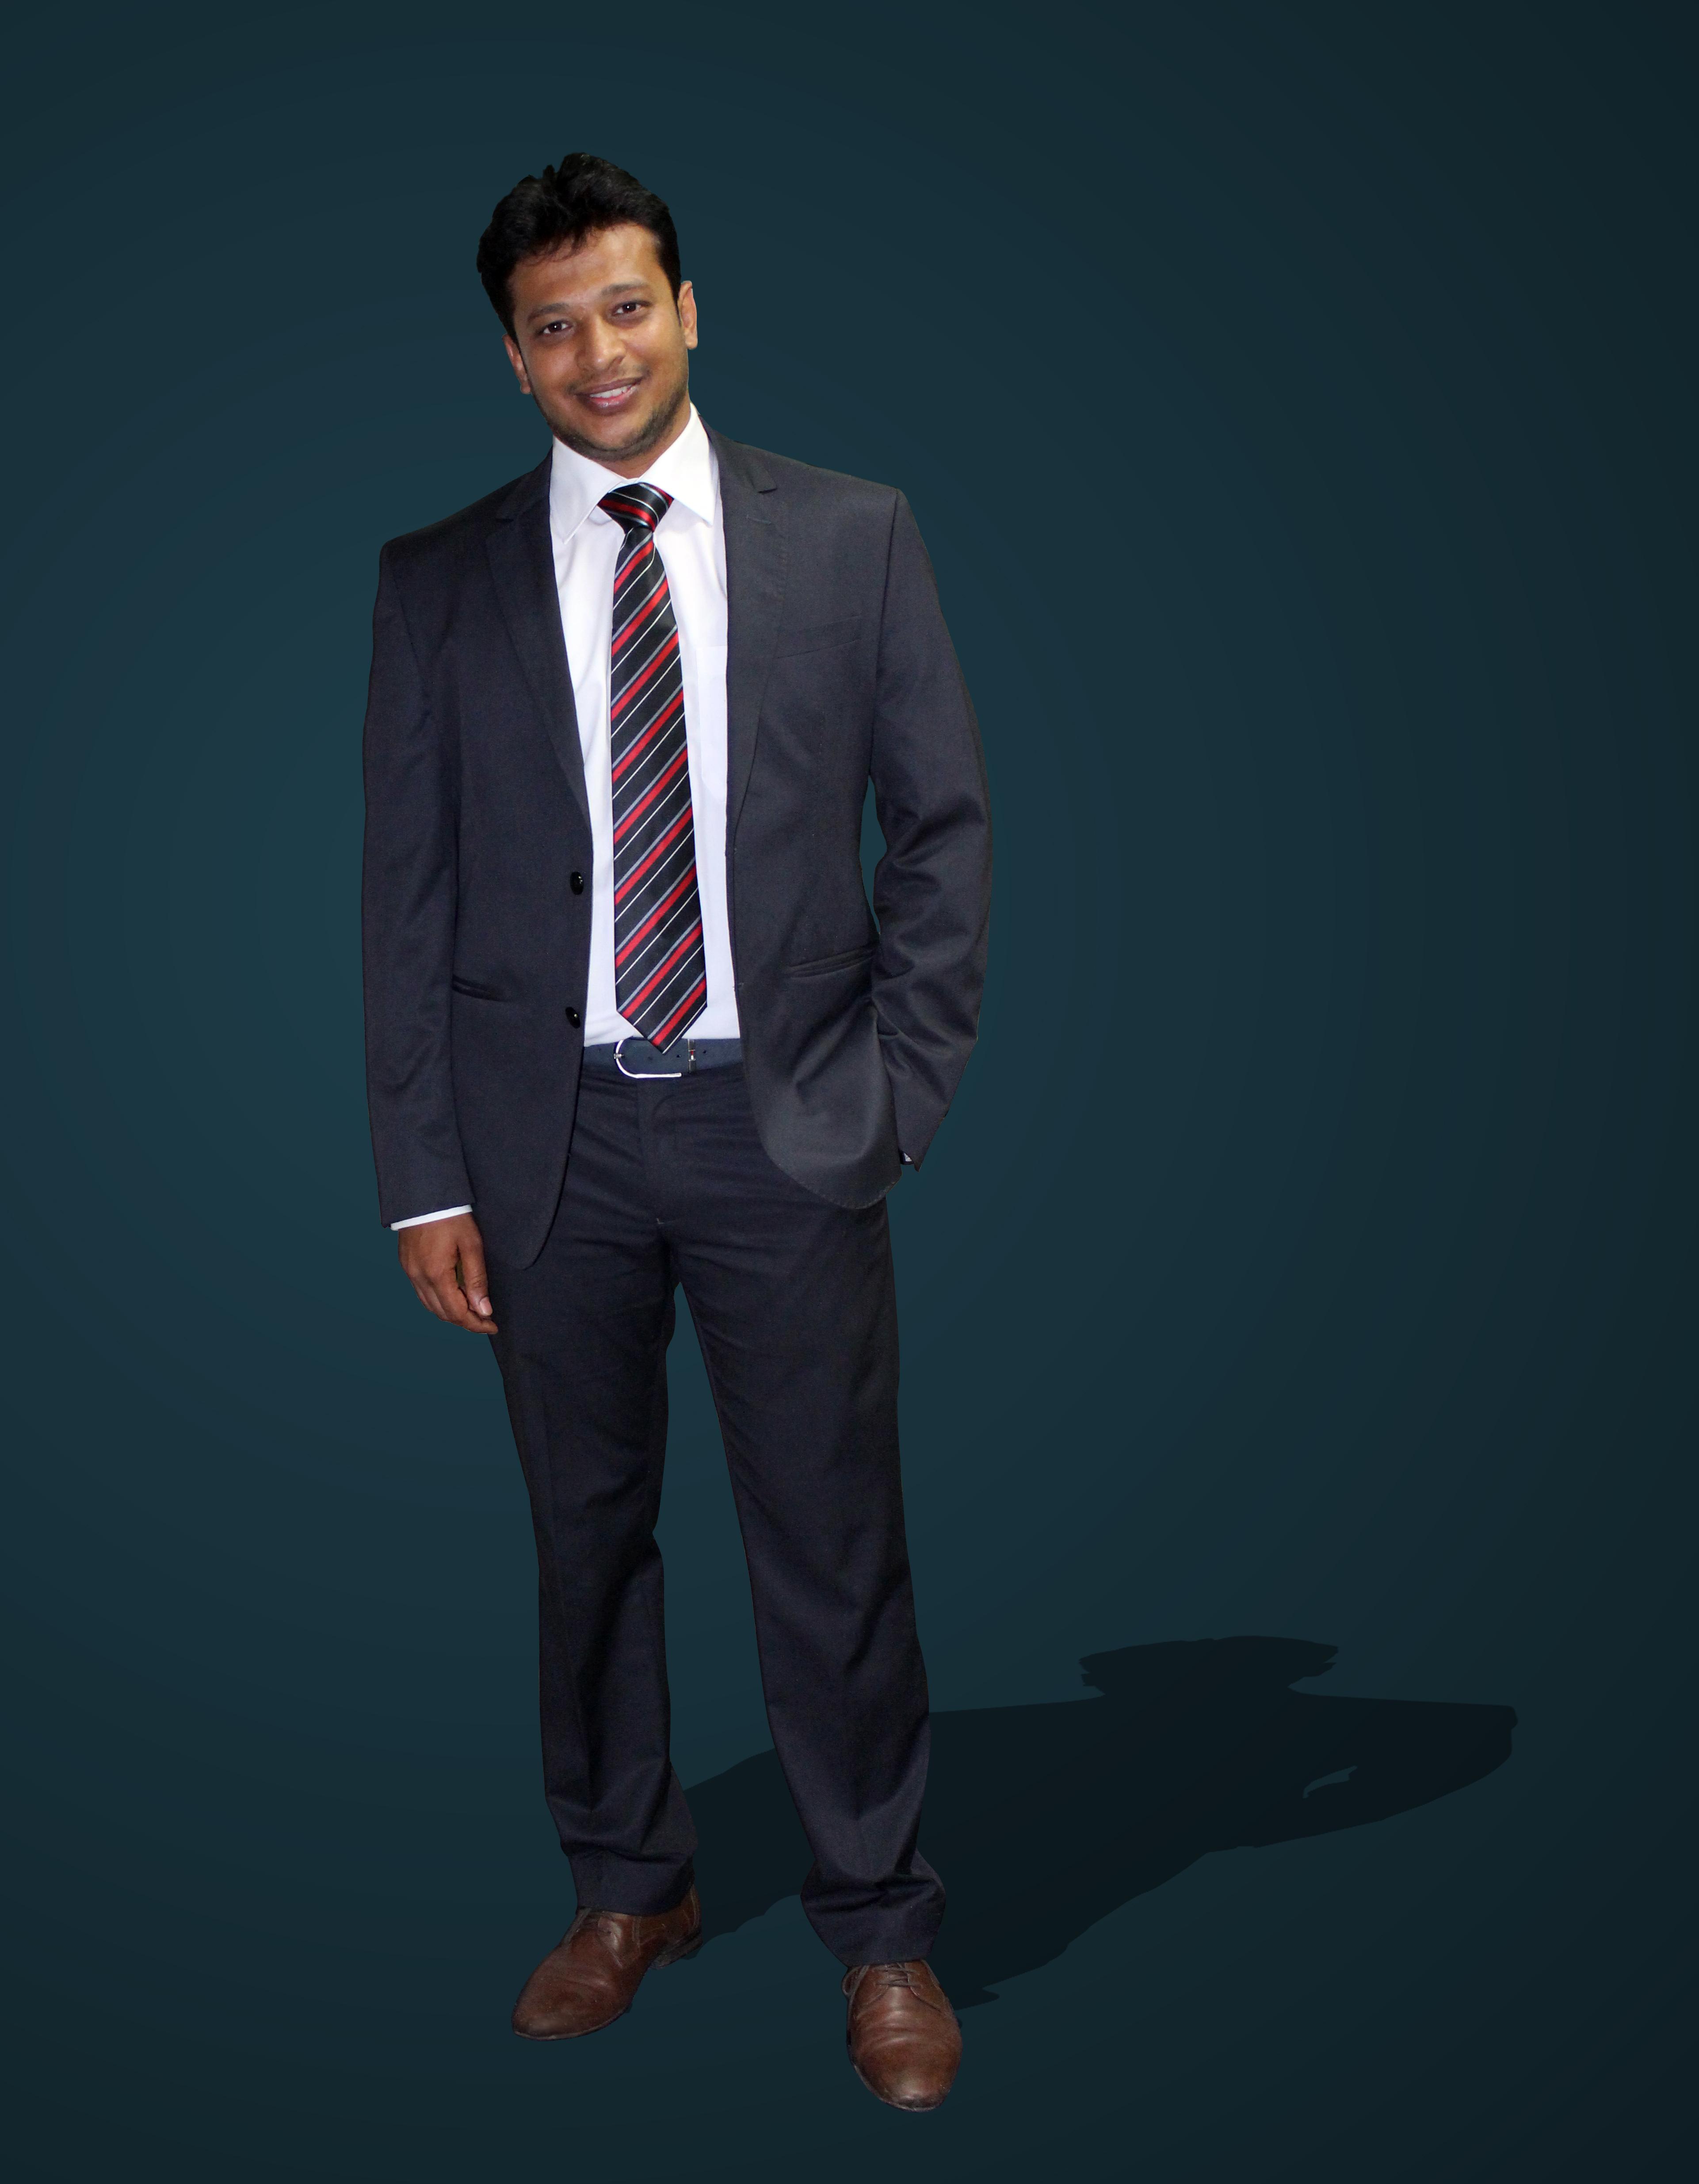 Kushal Nahata, Co-founder and CEO of FarEye